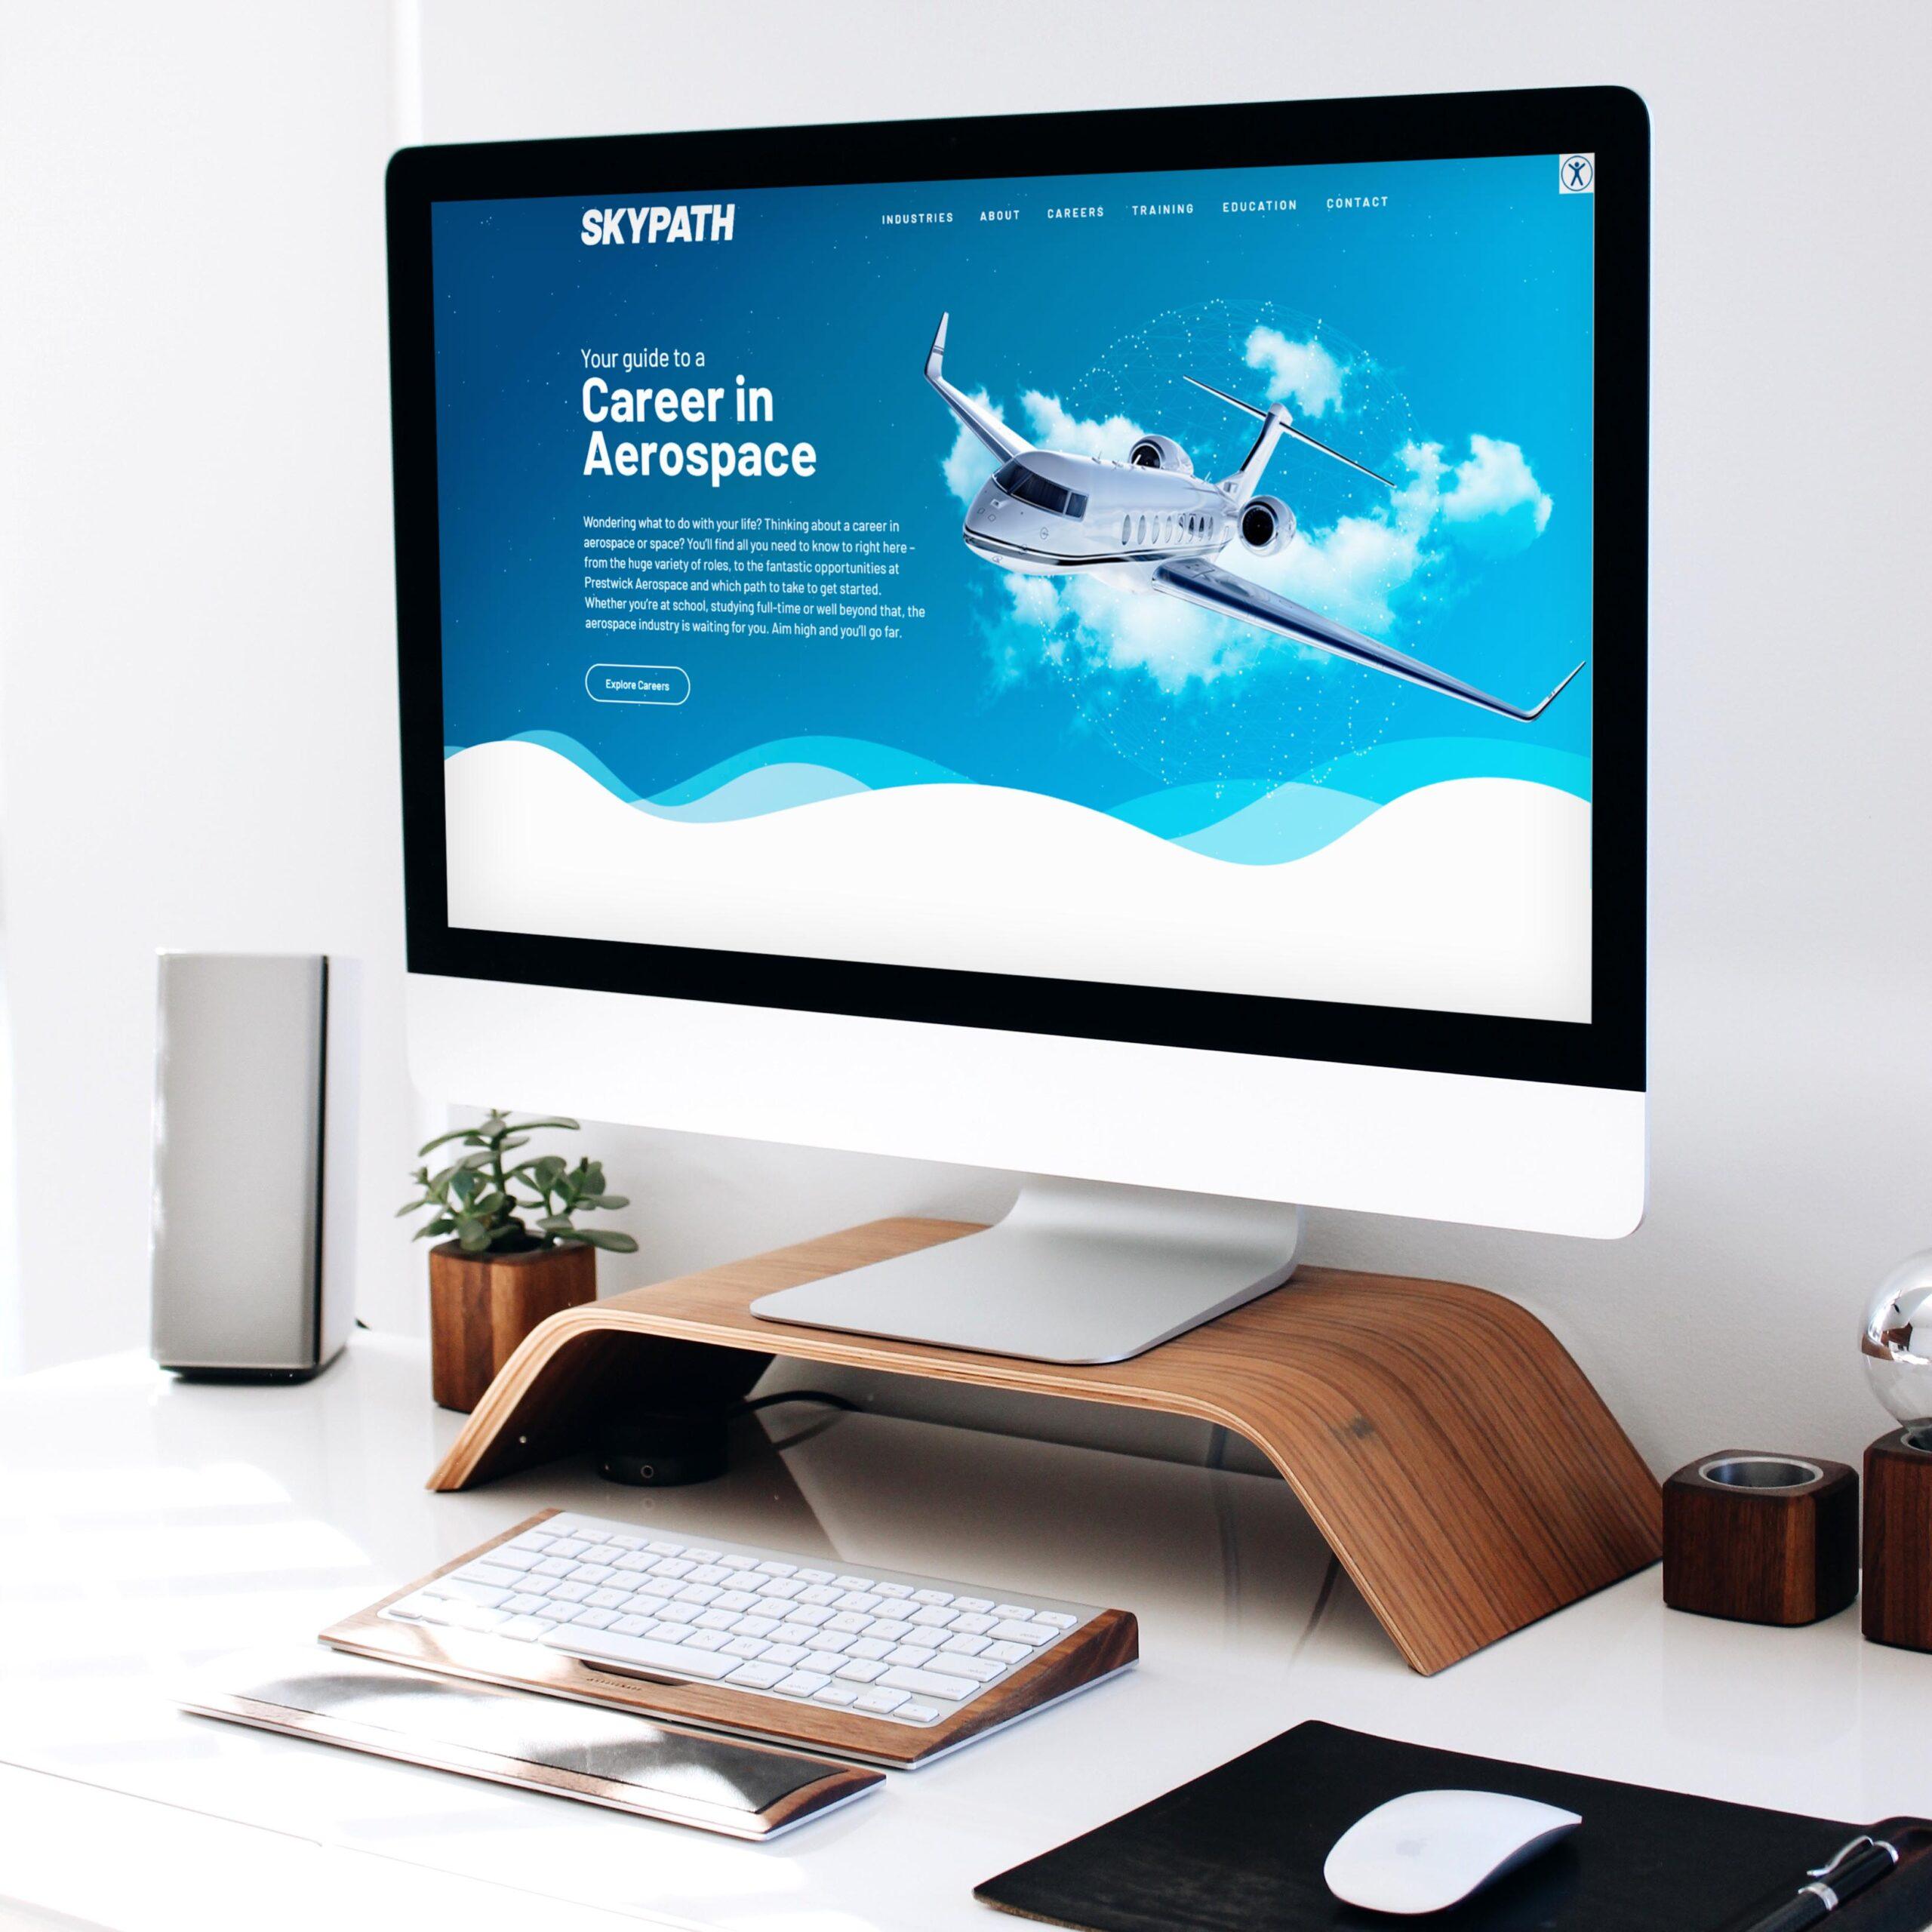 Skypath website